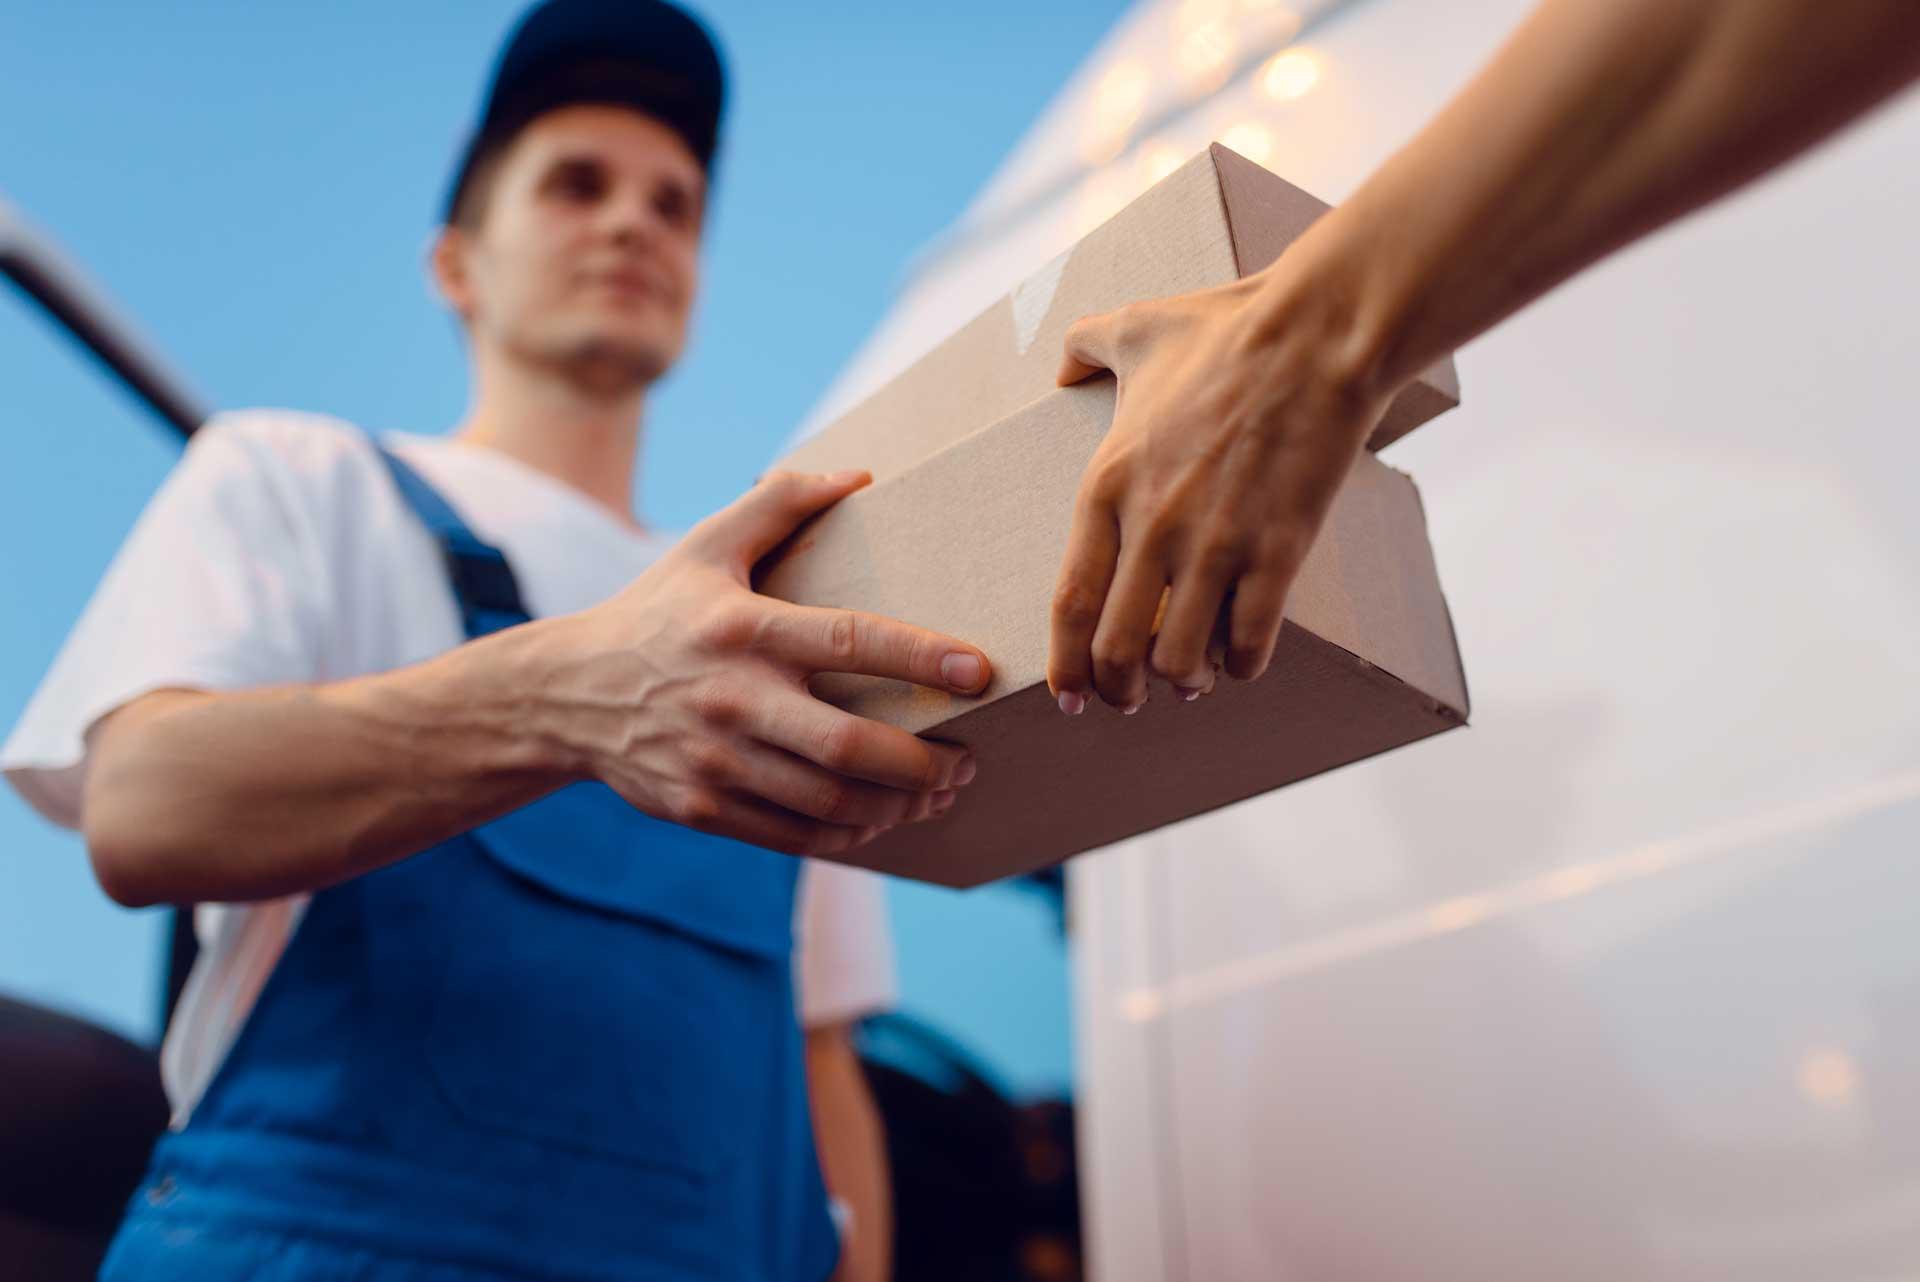 deliveryman-gives-parcel-to-female-recipient-HH3Z3T7.jpg